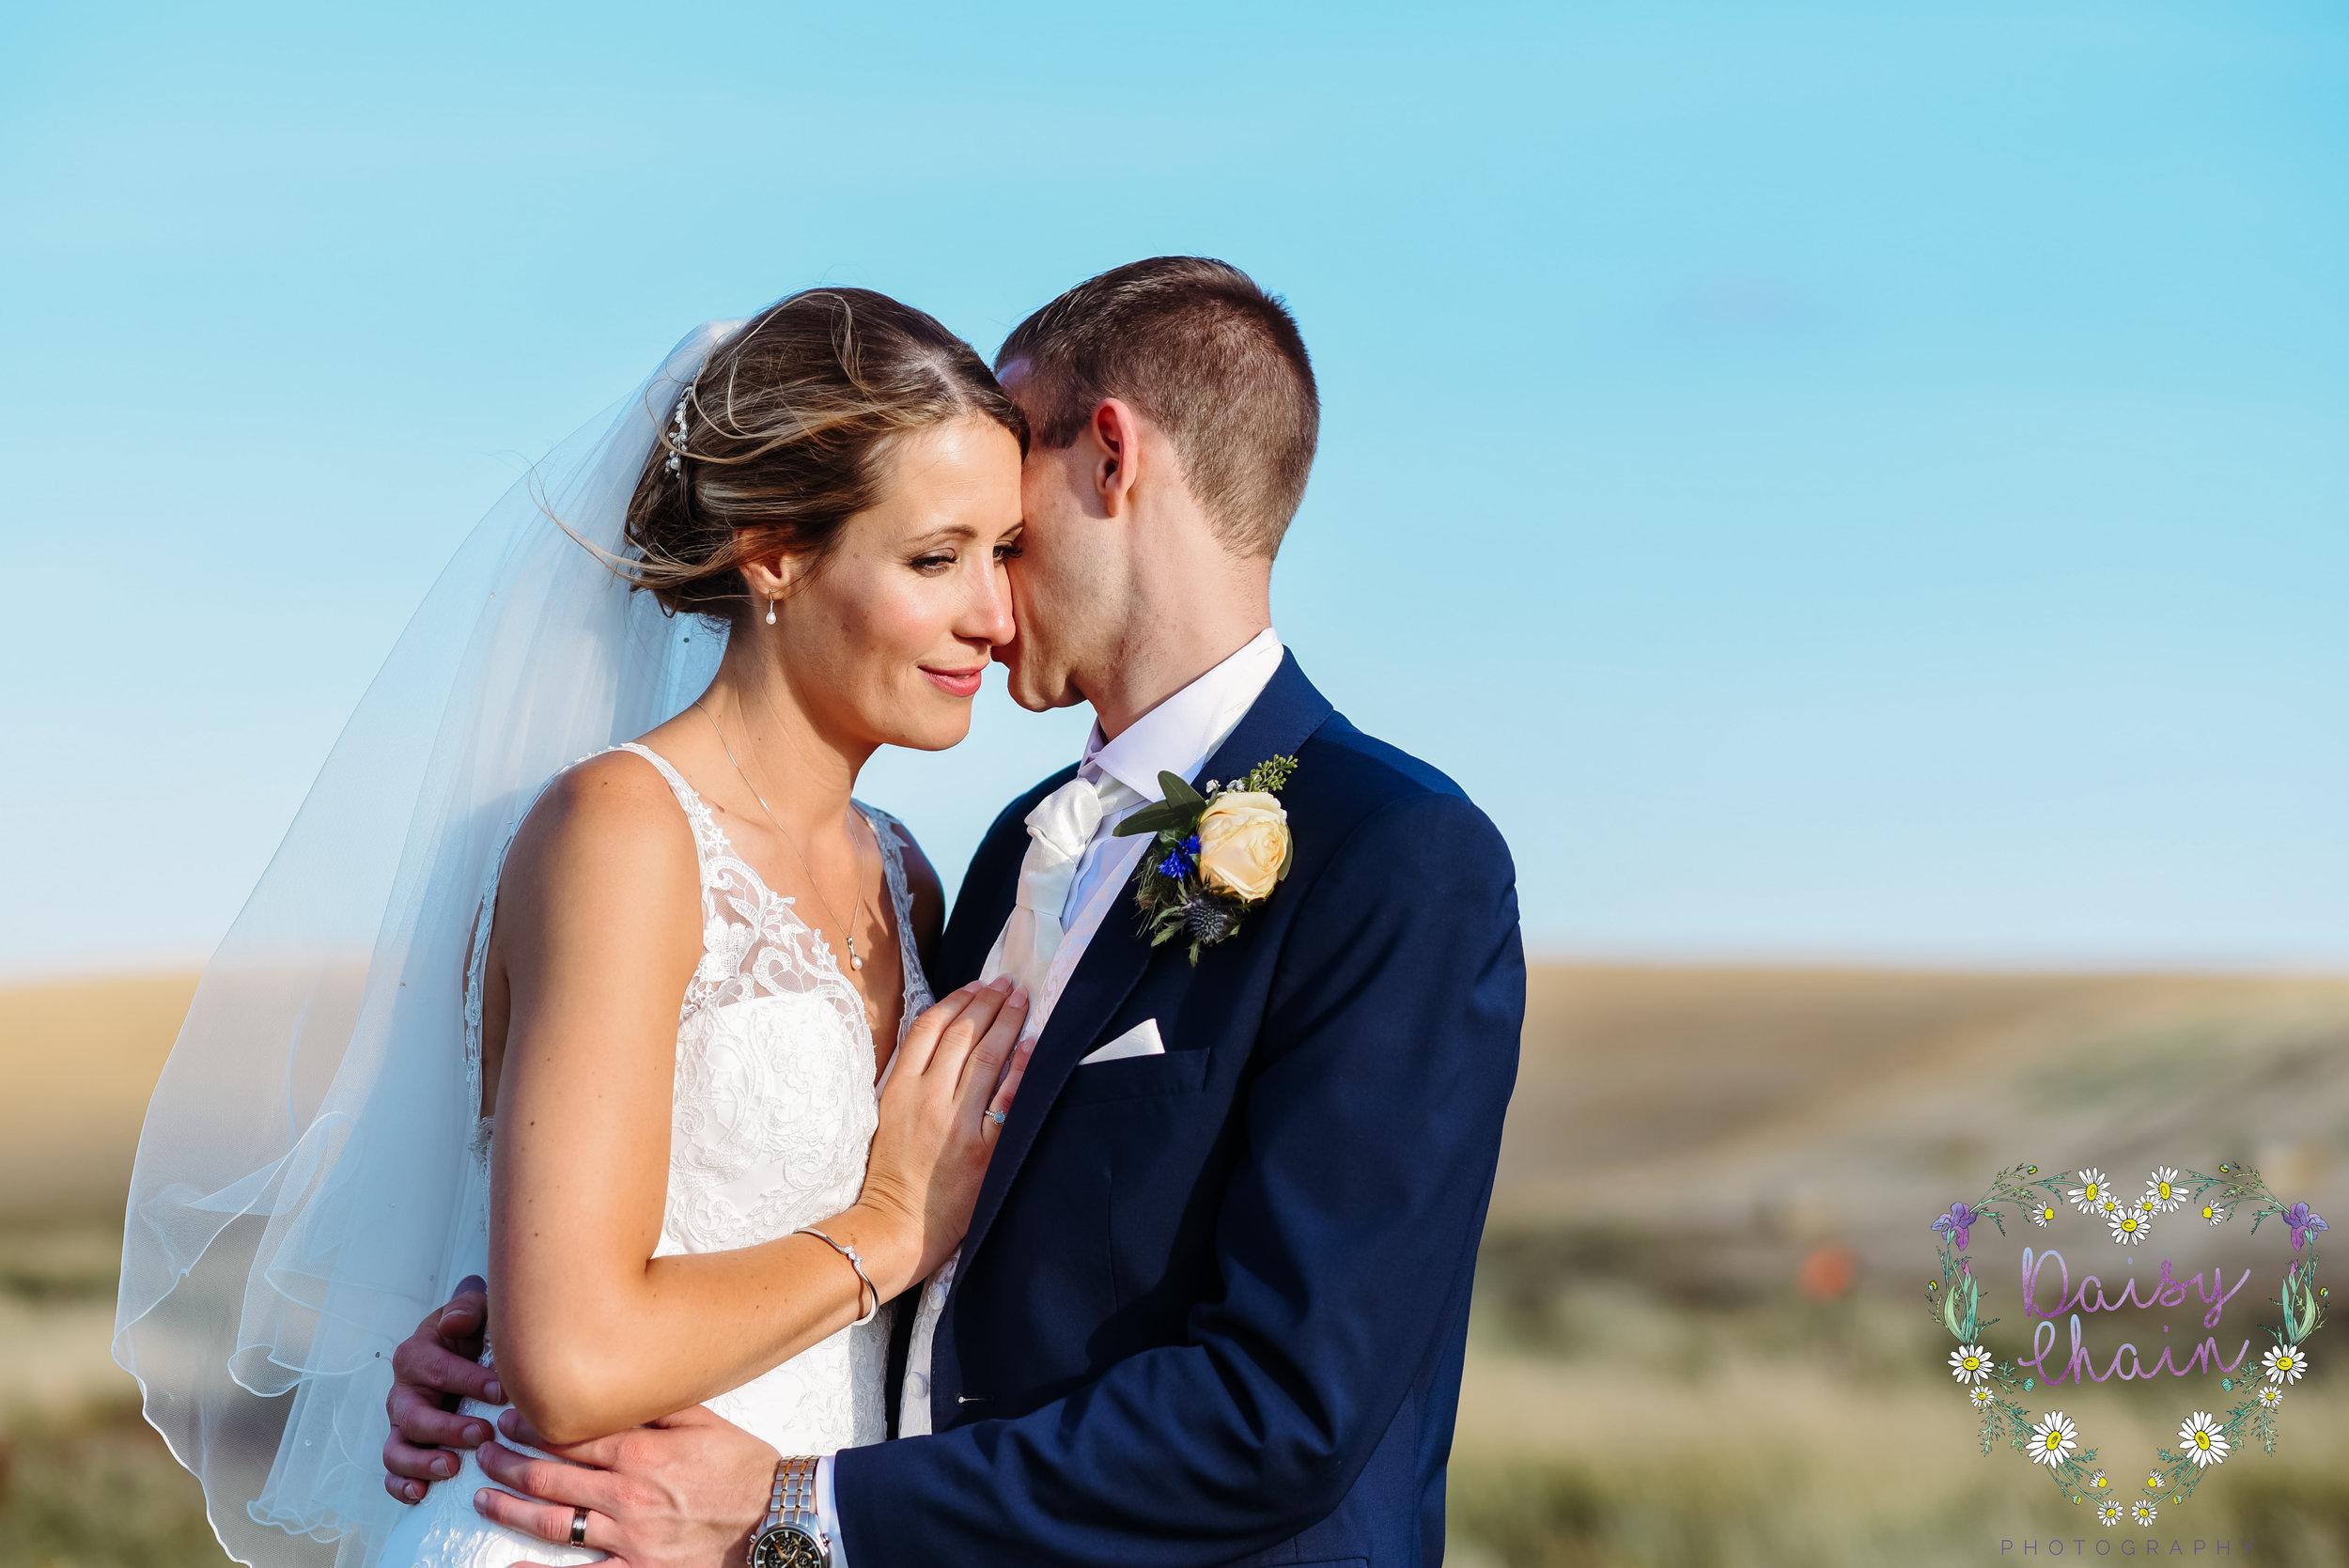 Gorgeous wedding photographs